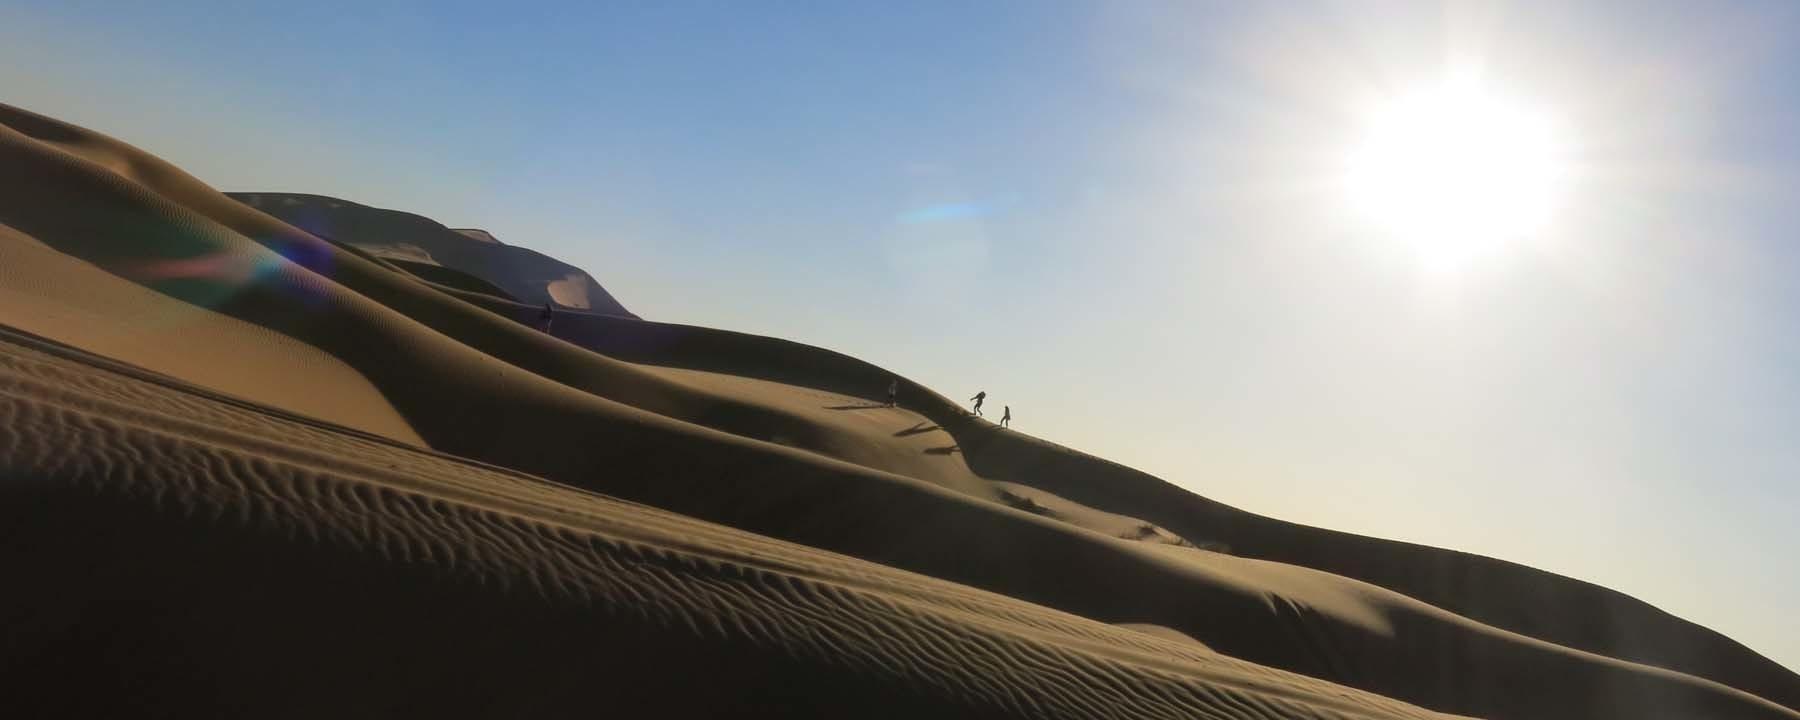 Morocco Sahara Desert Yoga Retreats_Source NOSADE